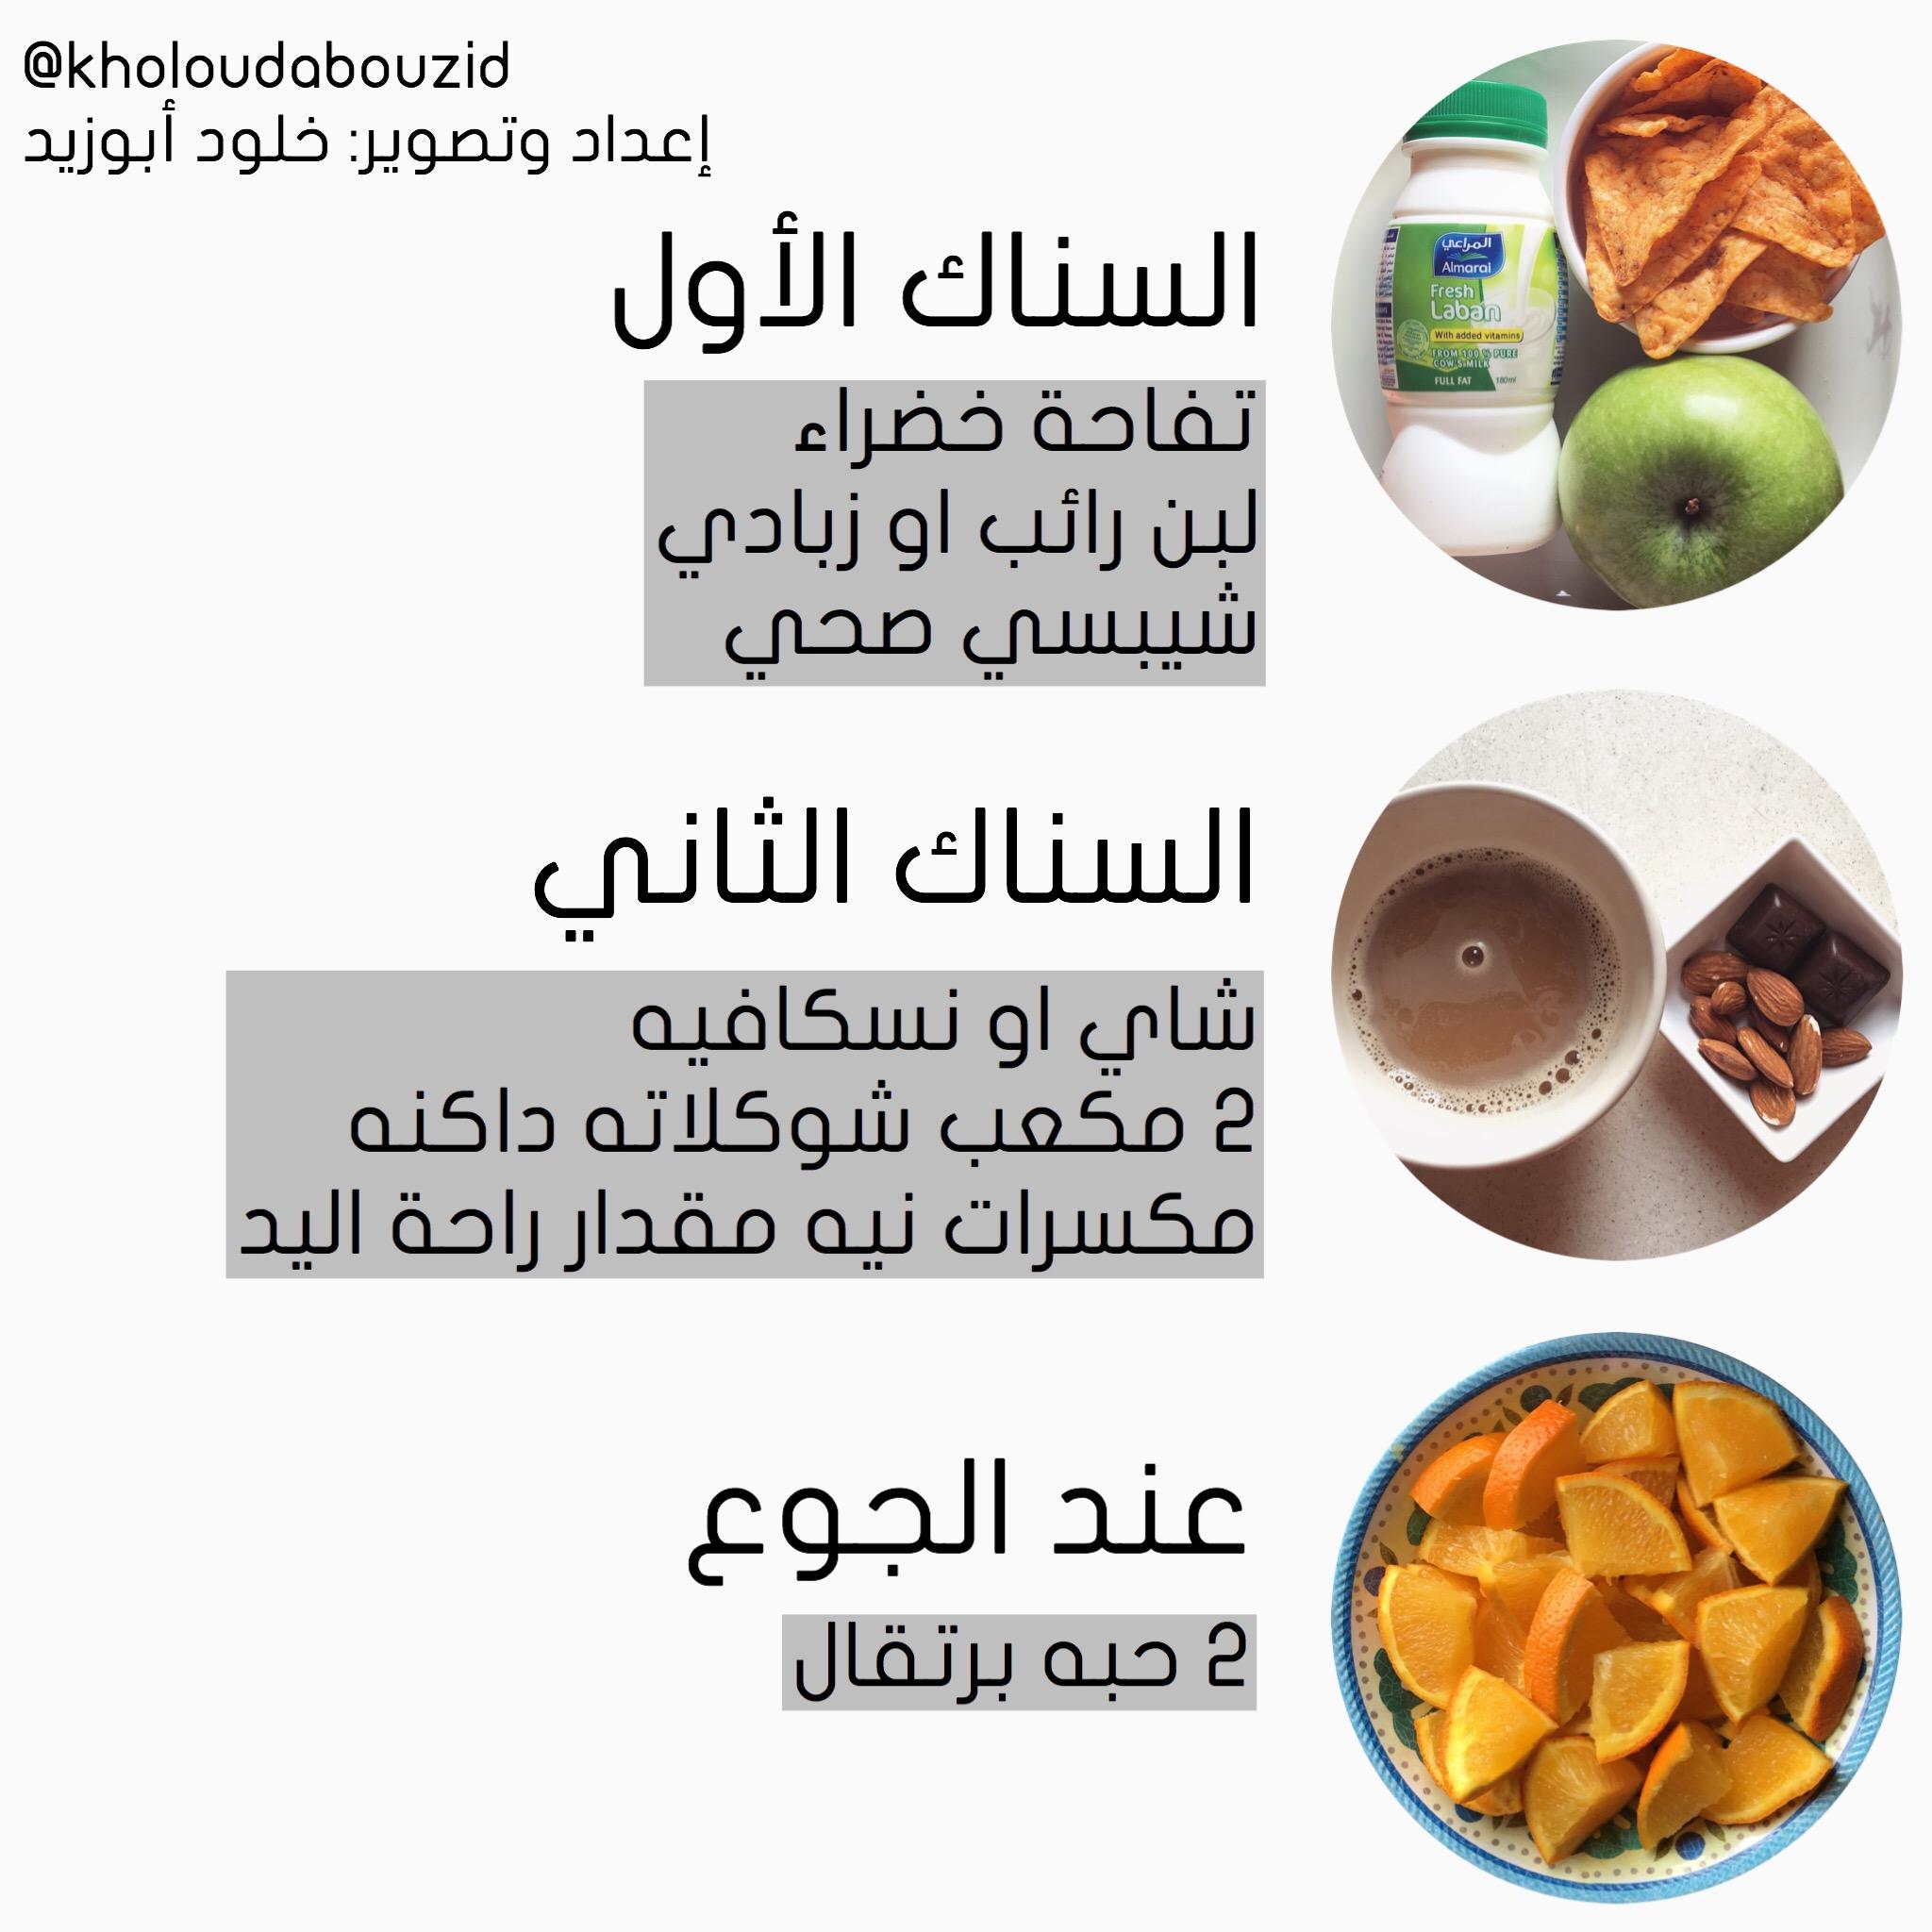 نظام دايت صحي ١٤٠٠ سعر حراري خلود ابوزيد